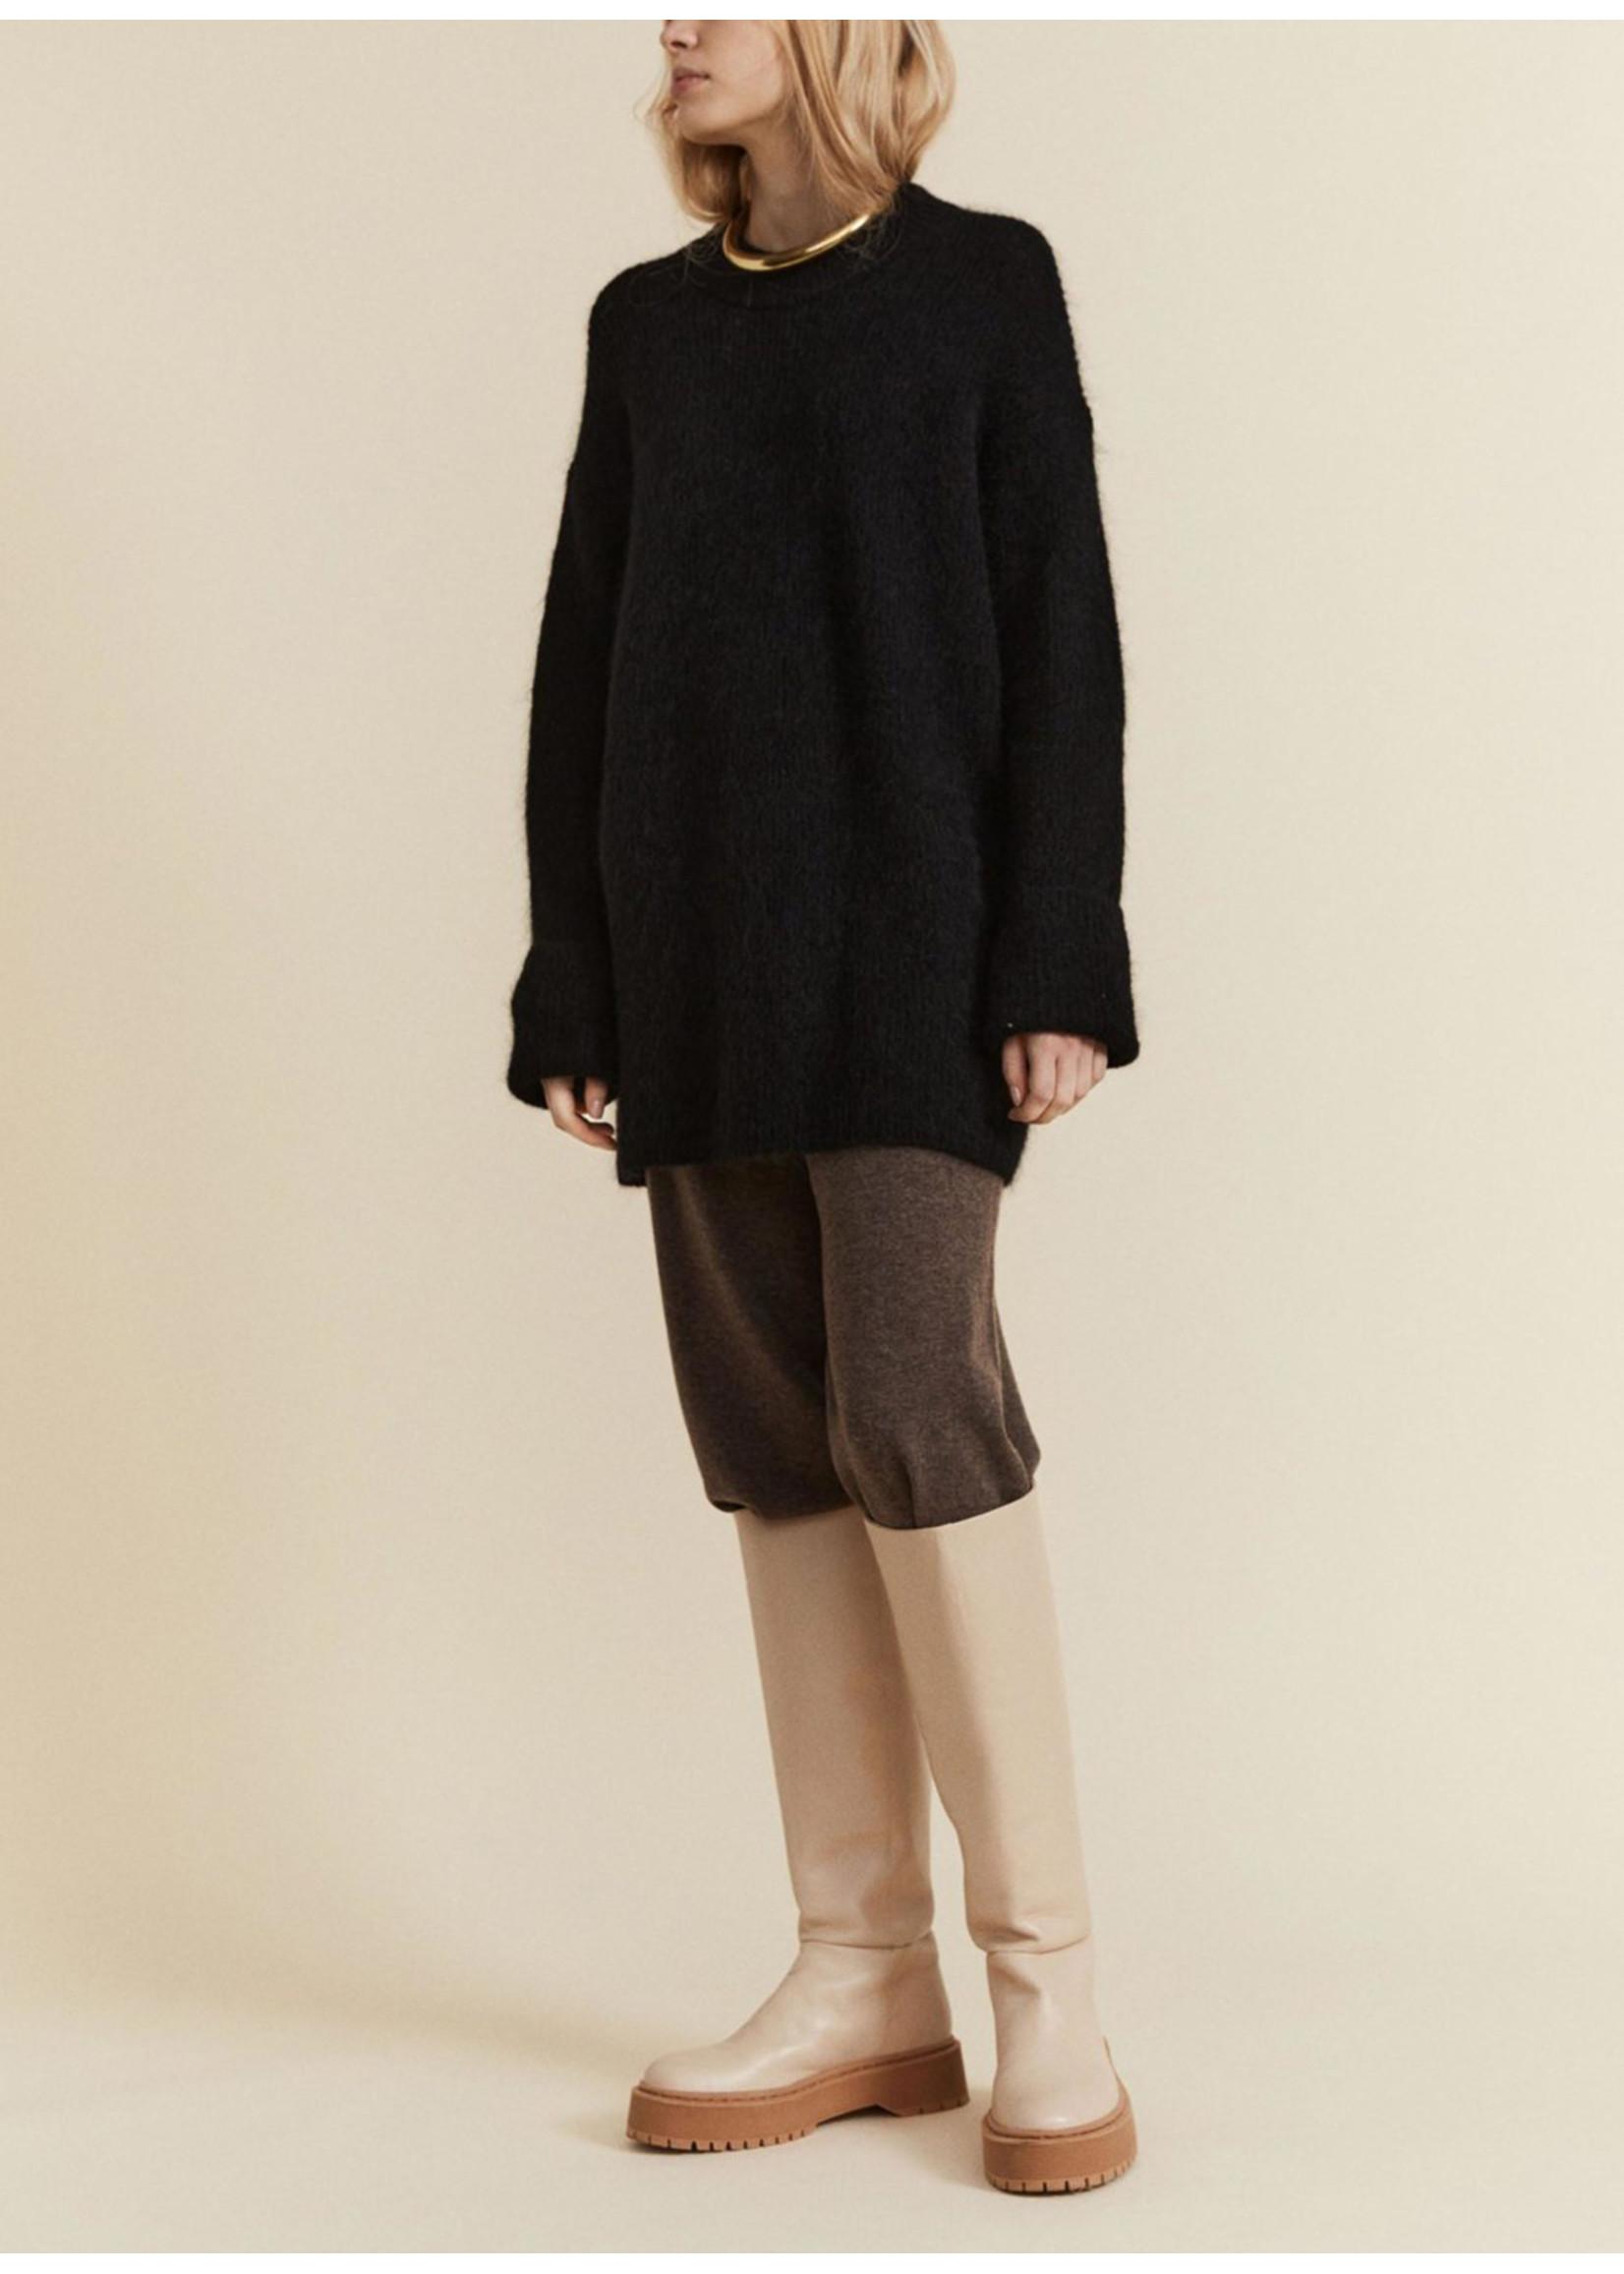 Malene Birger Cirla Knitwear Black